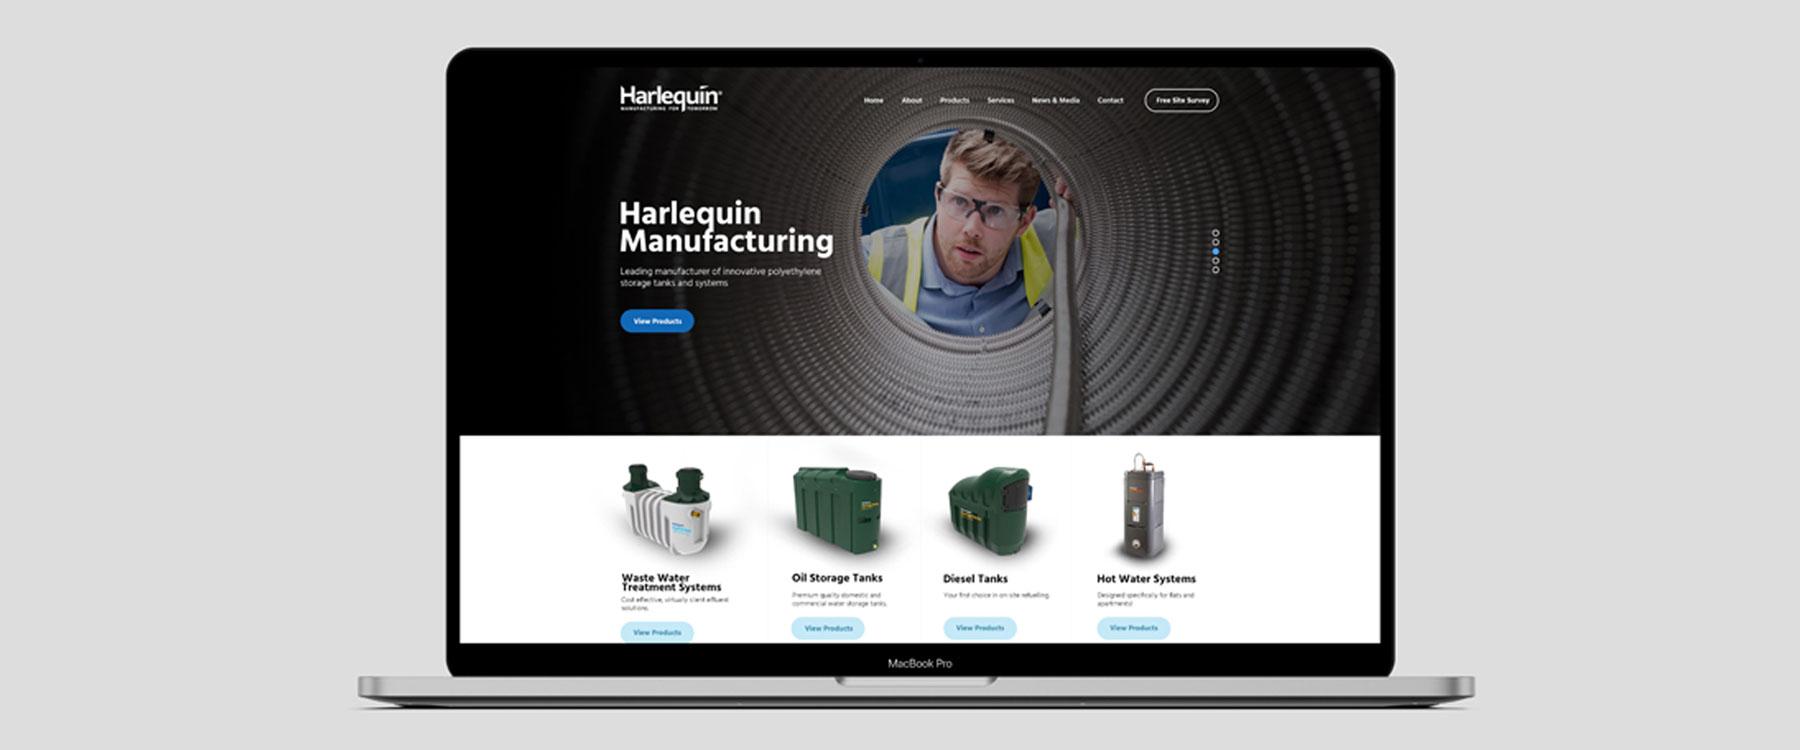 Bespoke new Website for Harlequin Manufacturing Image